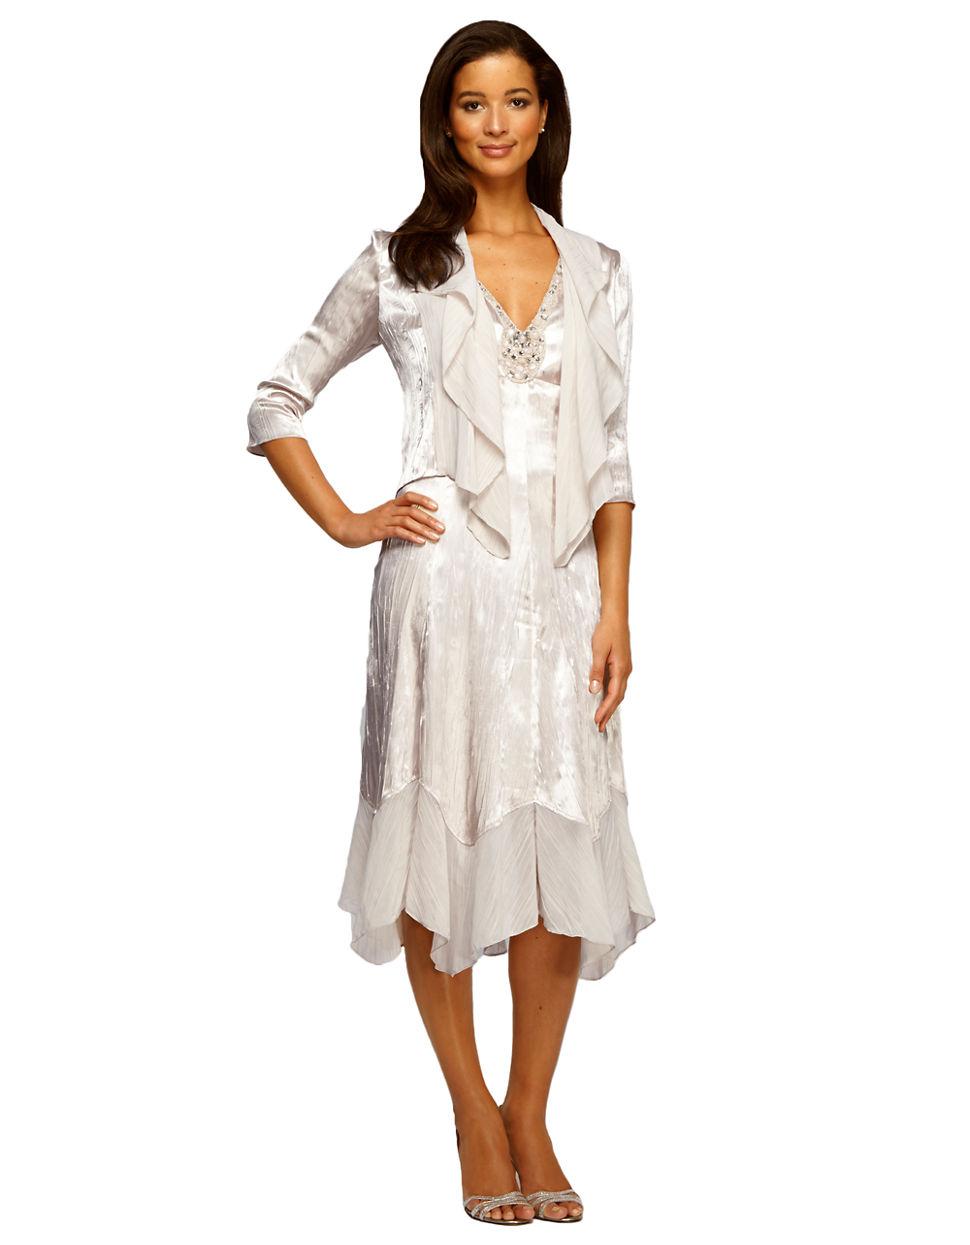 Wonderful Com  Buy Formal Female Skirt Suits For Women Work Wear Sets Jacket